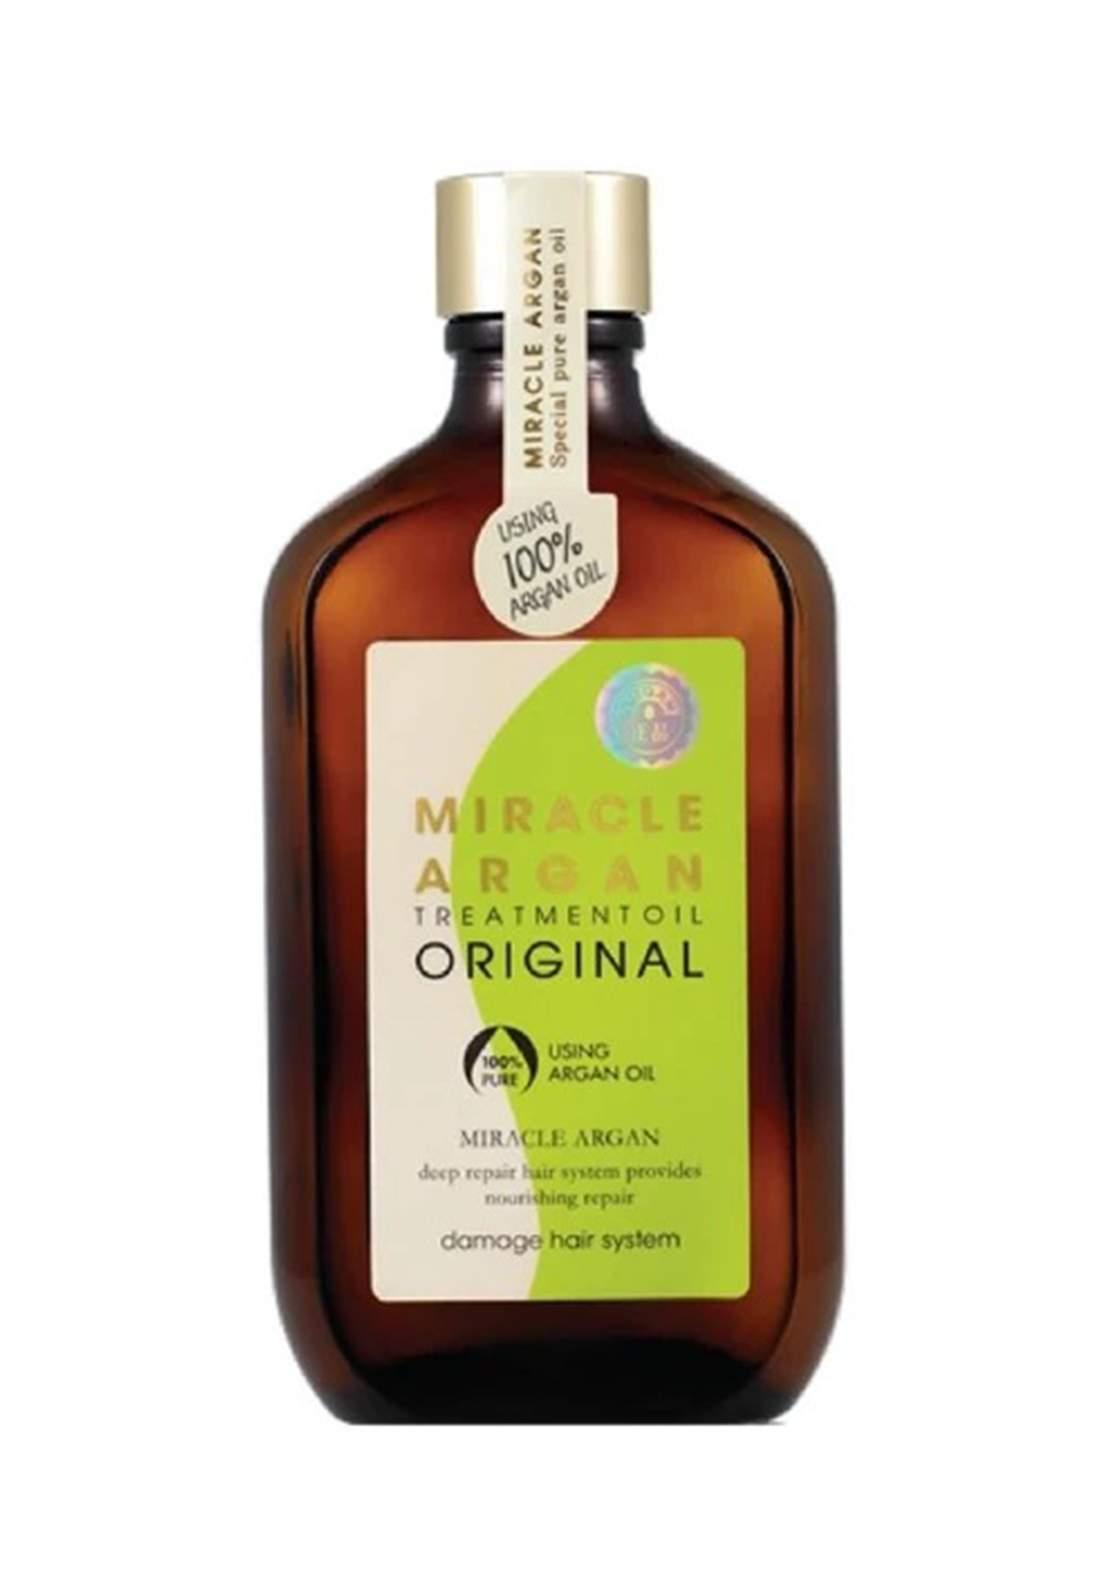 Miracle Argan Treatment Oil Orginal 100 ml زيت للشعر